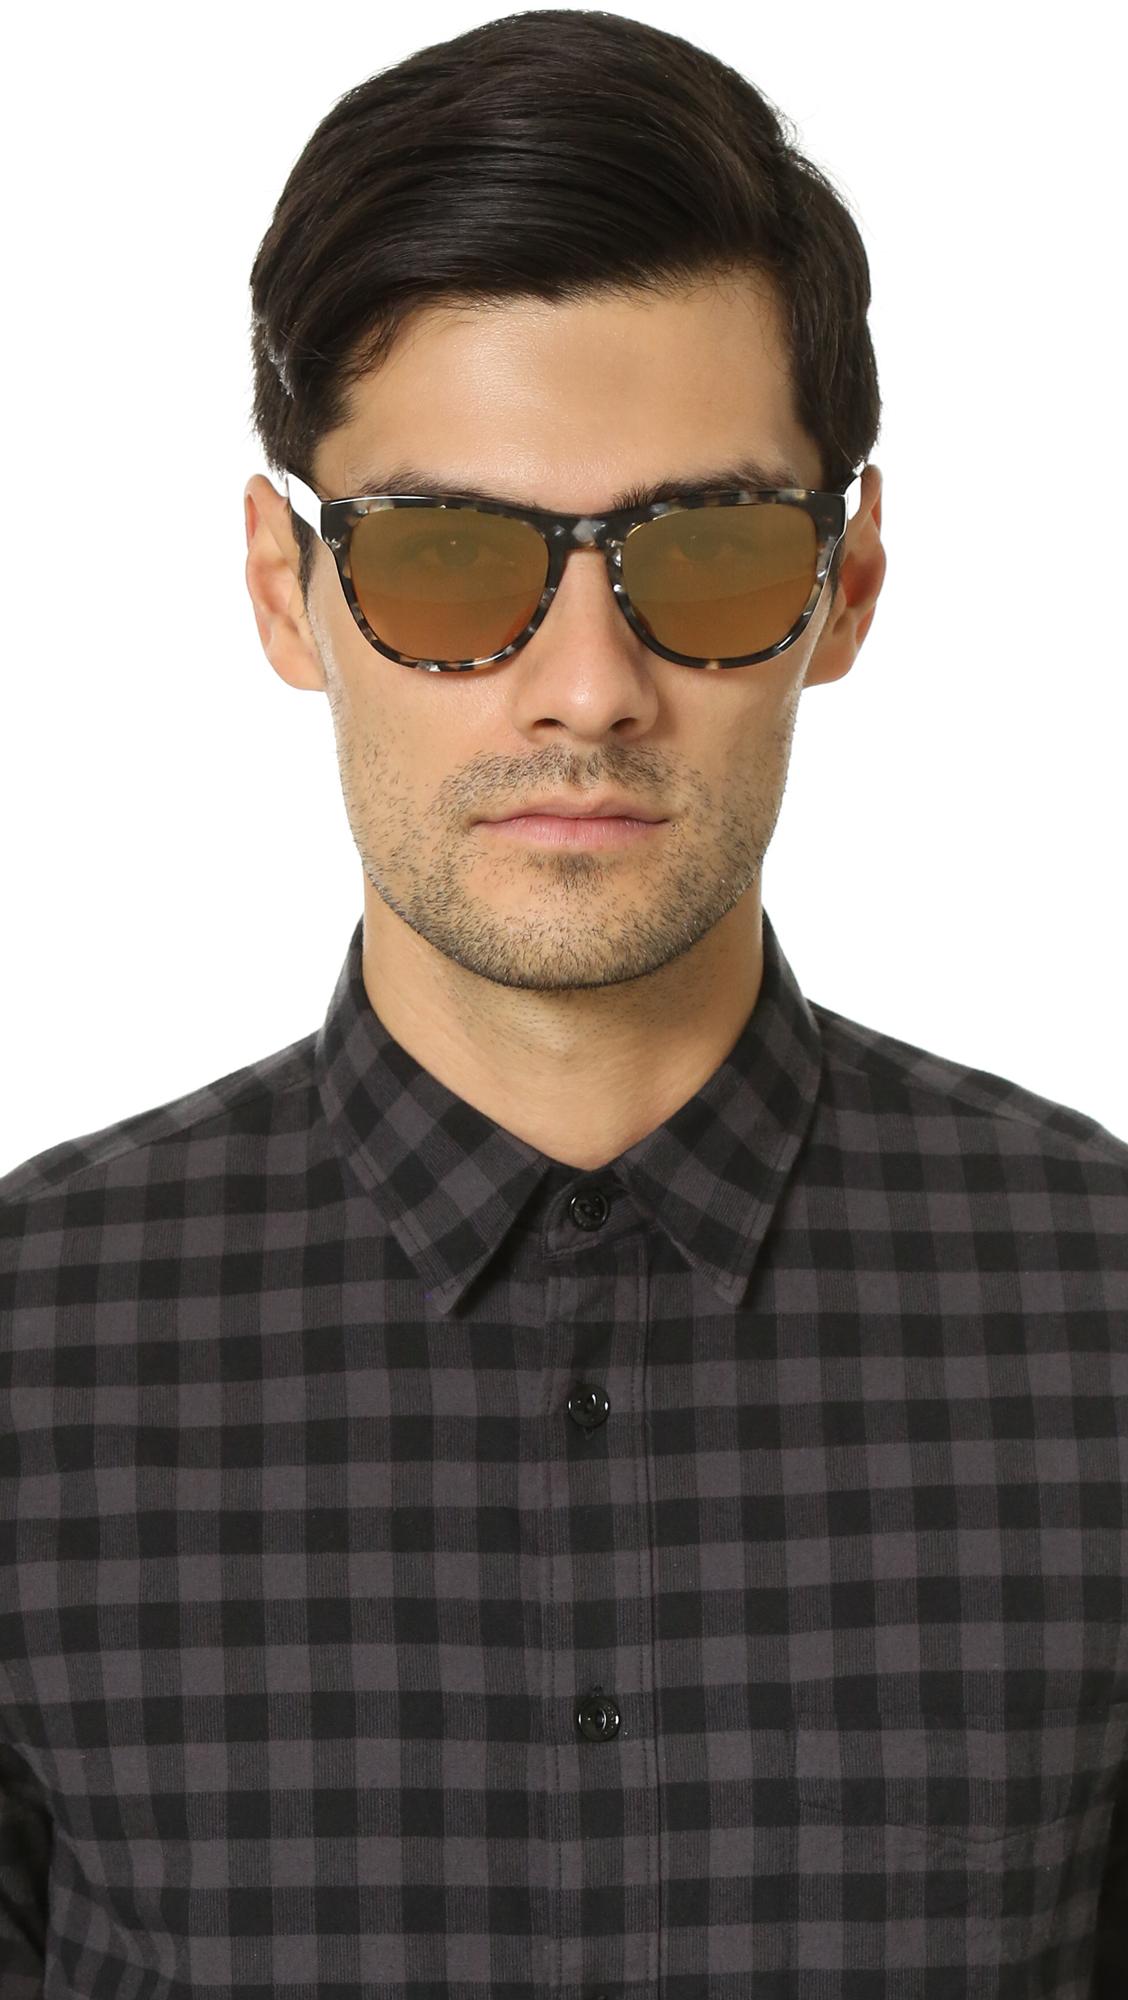 paul smith sunglasses pjwx  Gallery